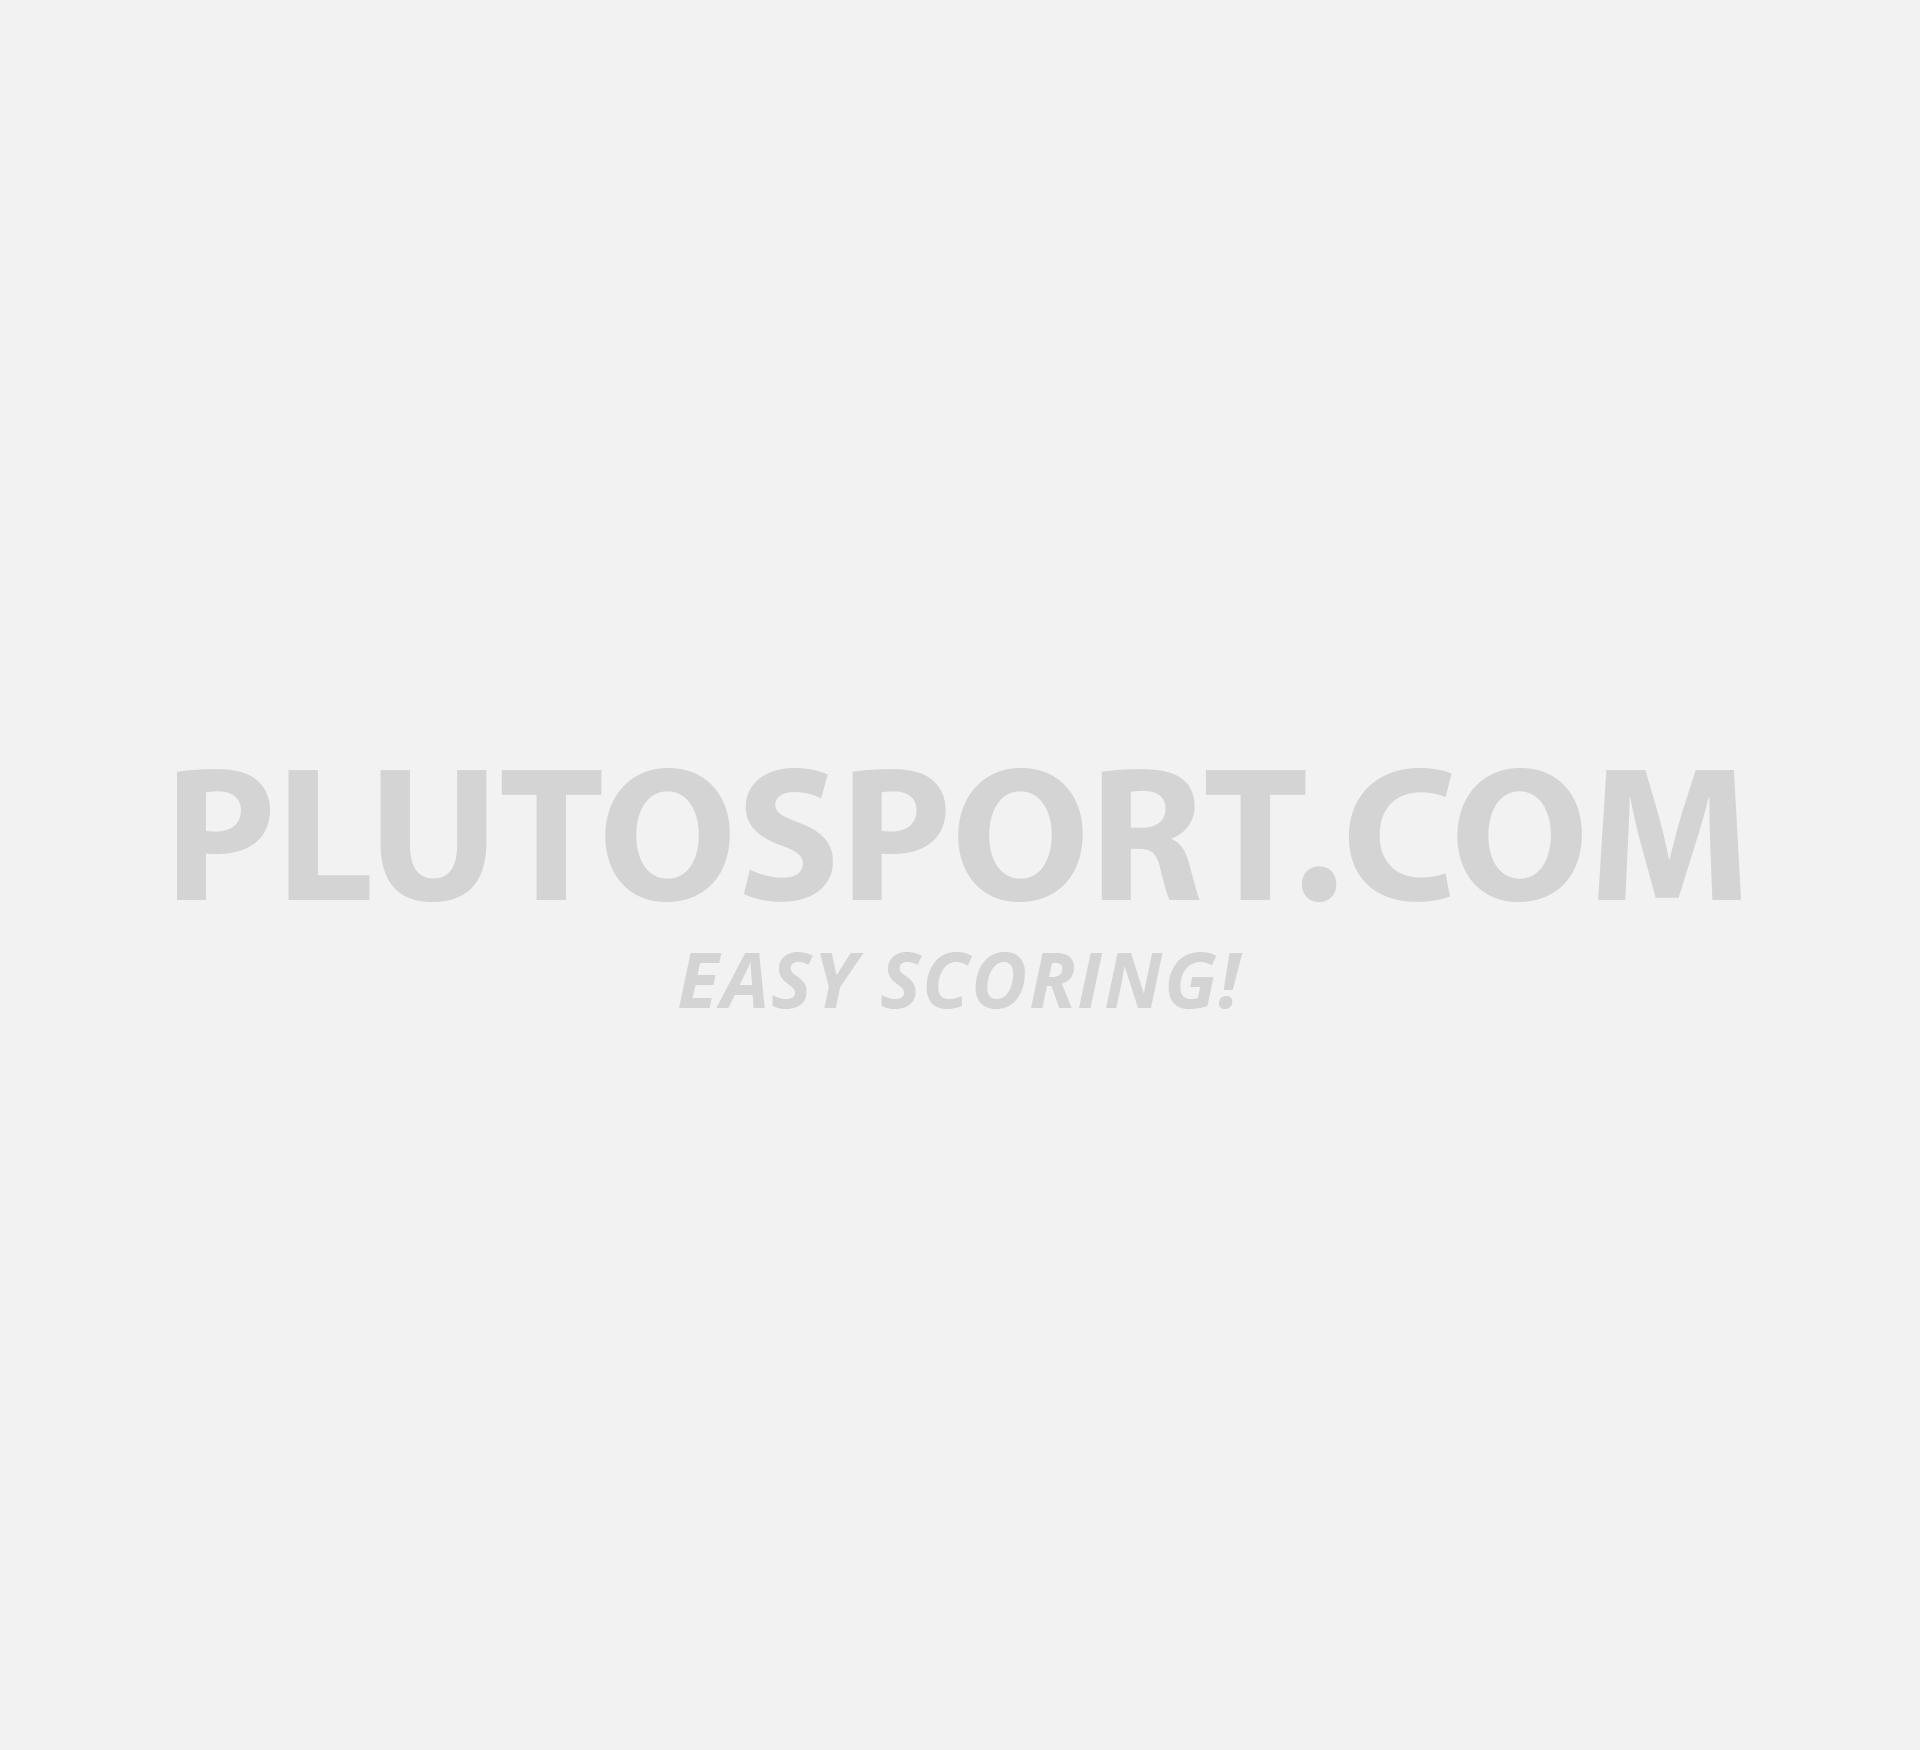 Calvin Klein Trunk Boxershort Men (6-Pack)